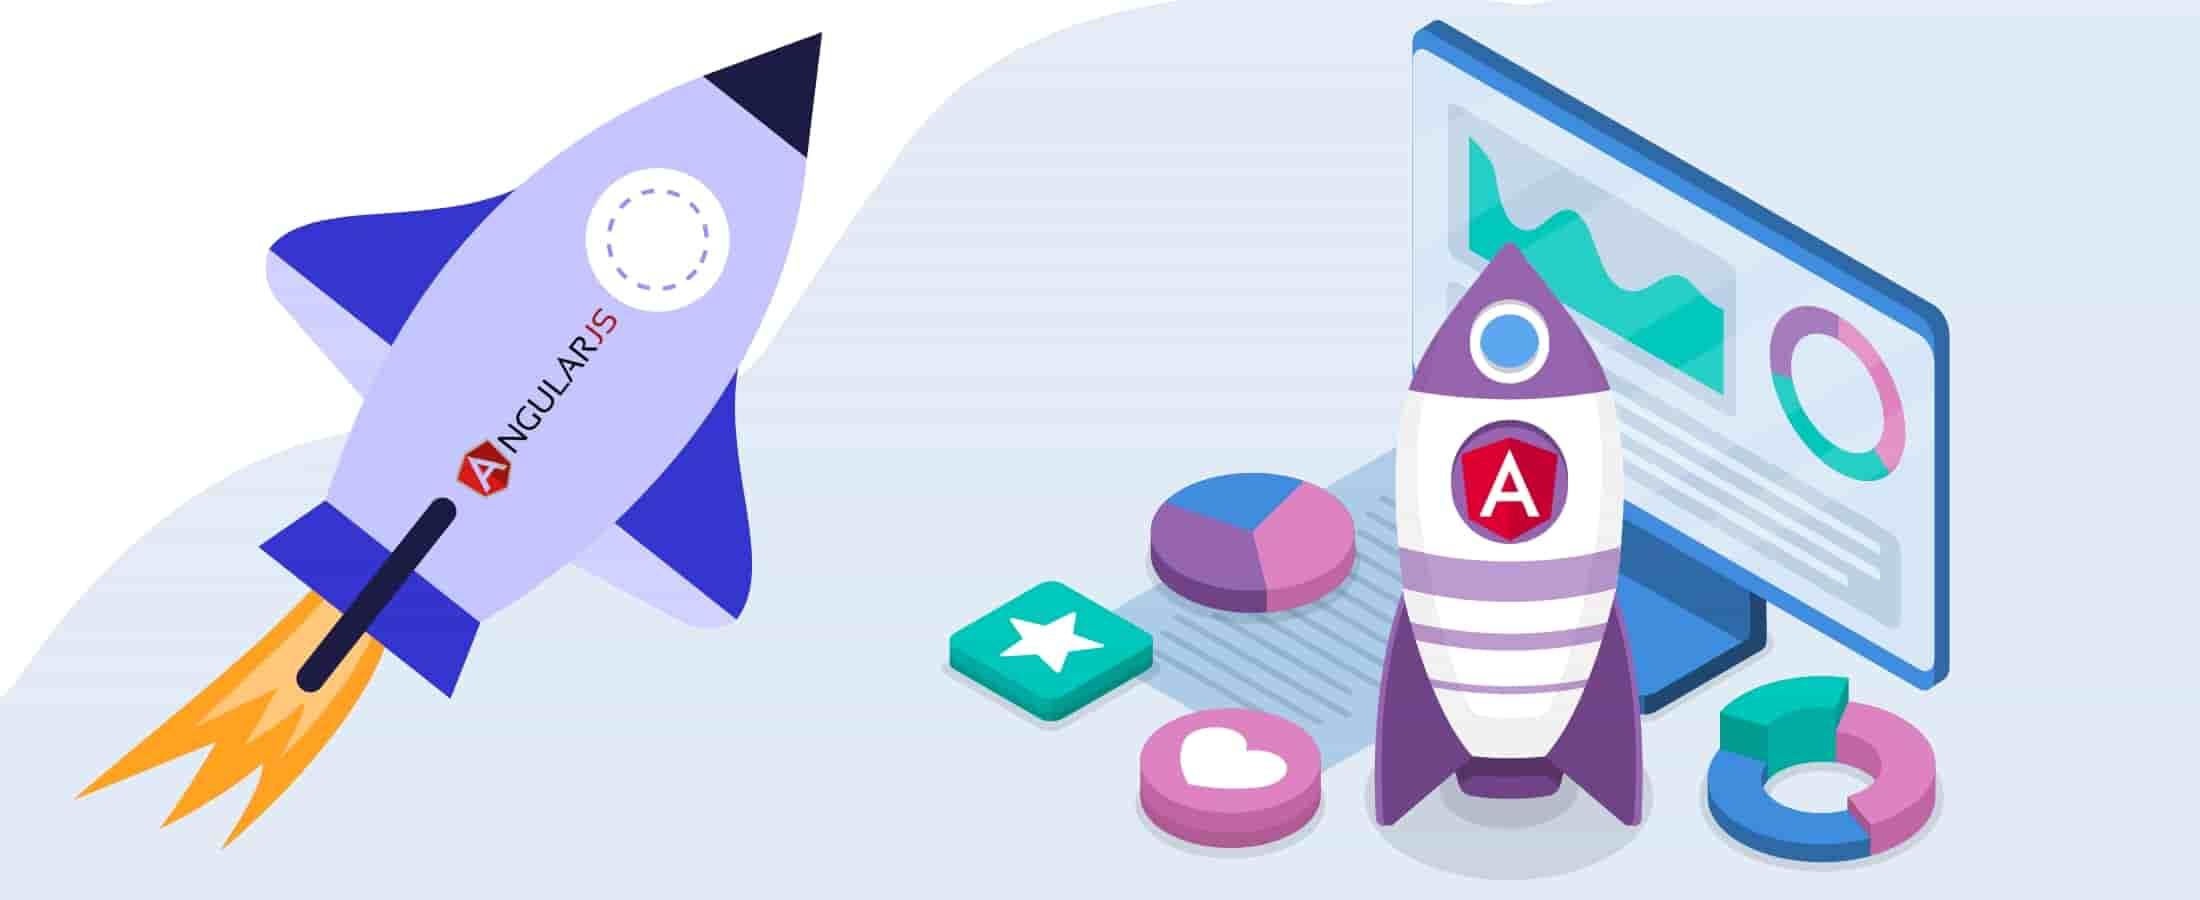 An insight into Angular 13 for angularjs web application development - Moon Technolabs